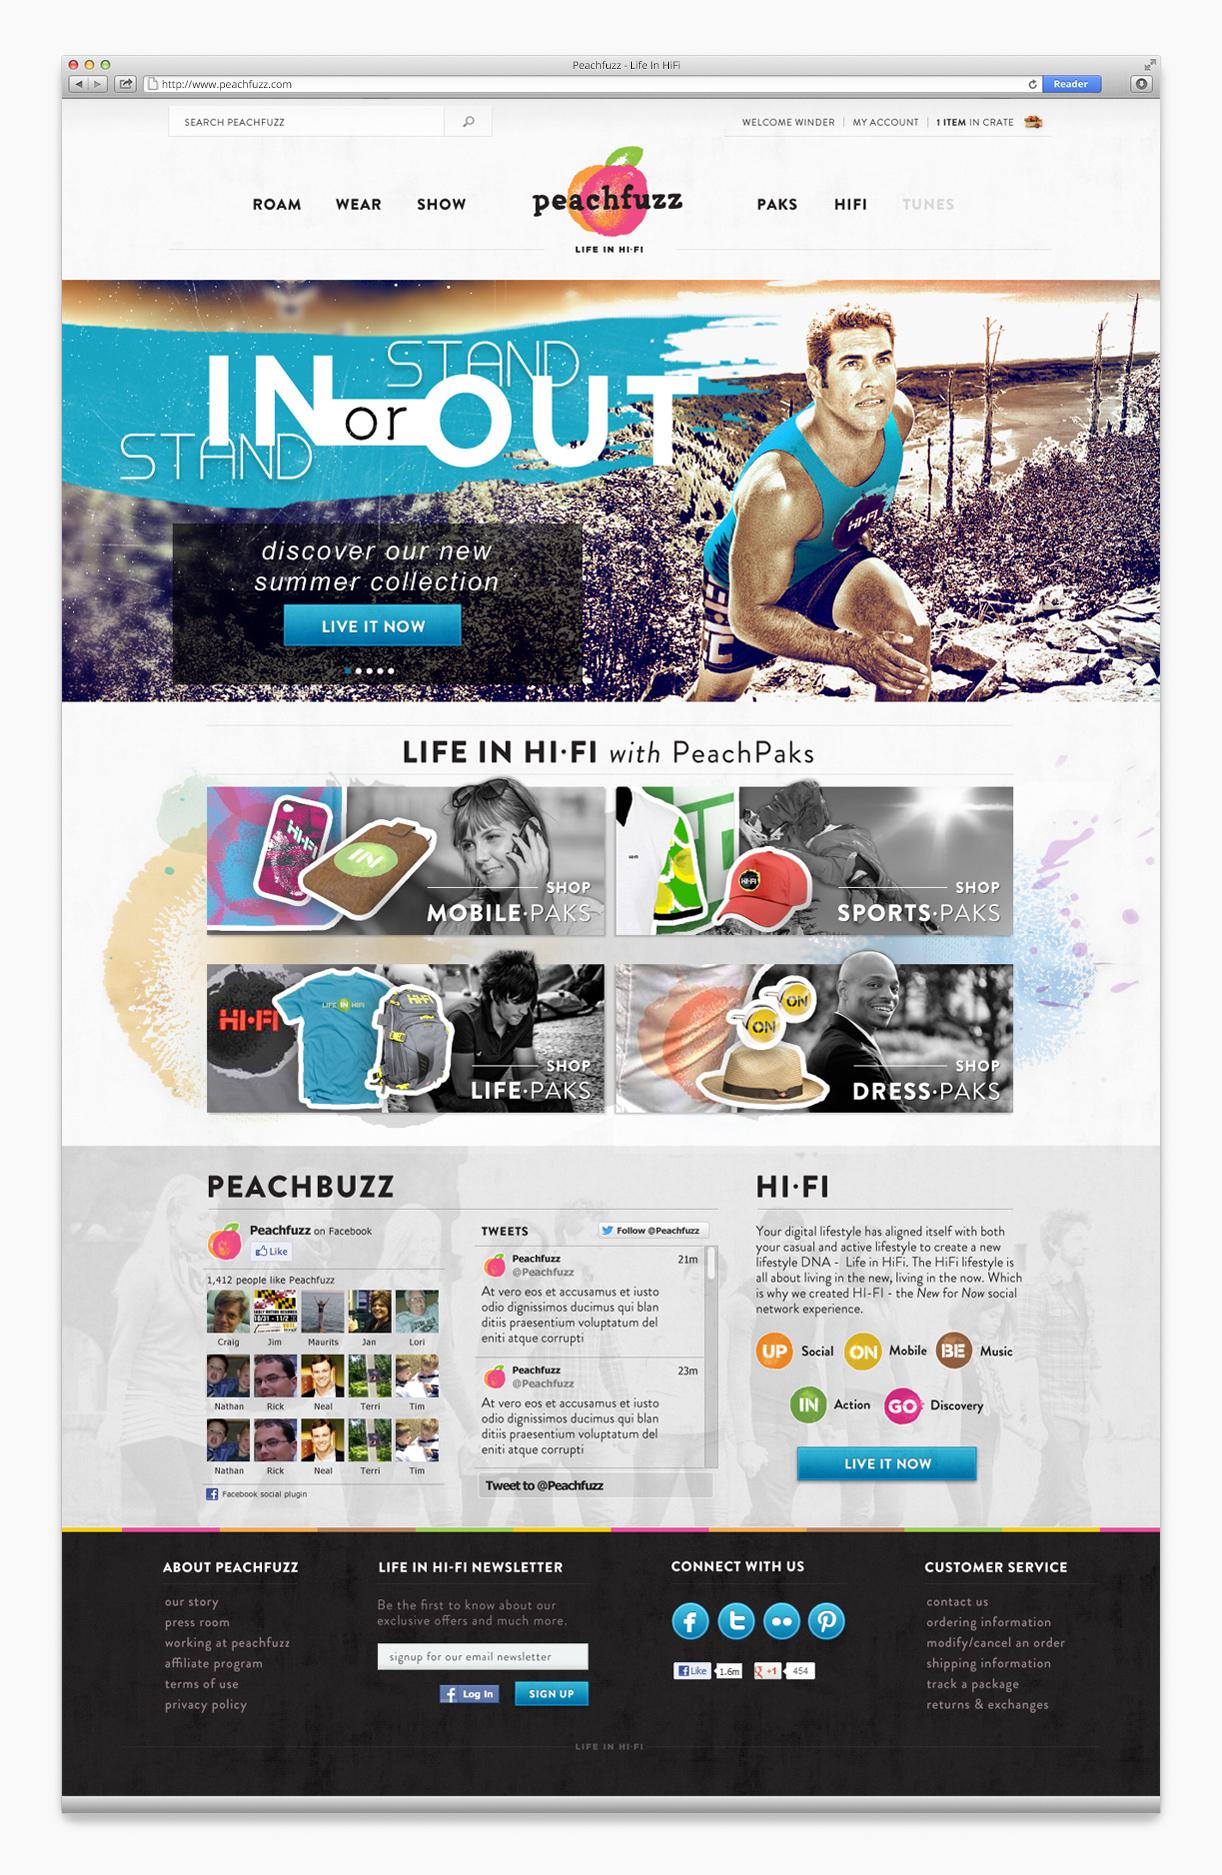 interactive_lifeinhifi_image13